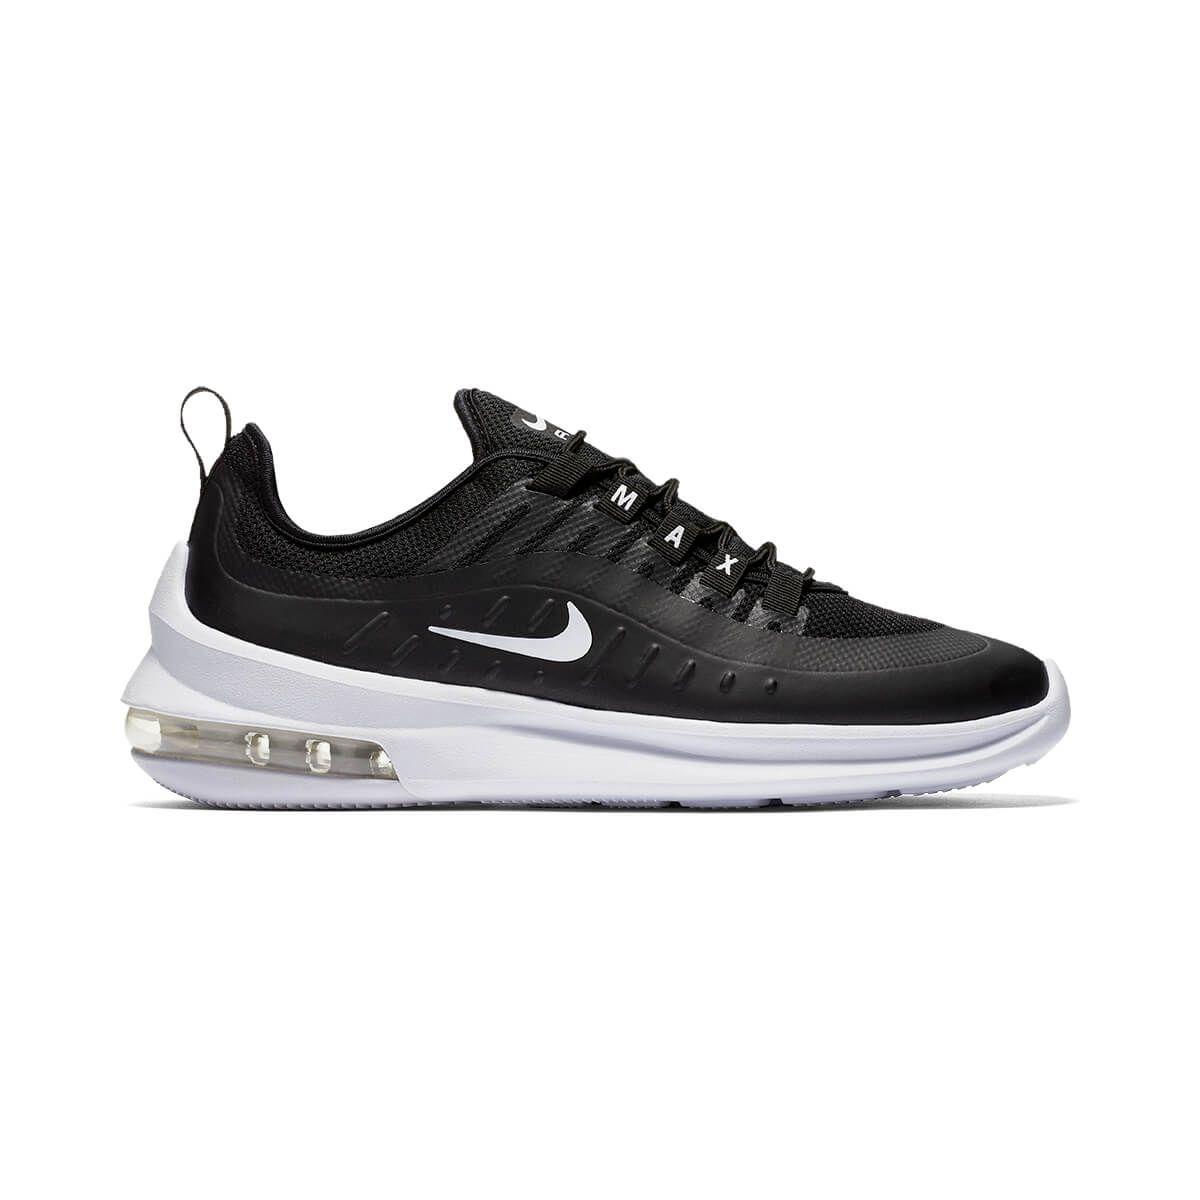 Nike Nike Wmns Air Max Axis Siyah Beyaz Kadin Kosu Ayakkabisi Flo Ayakkabi Air Max Nike Air Max Nike